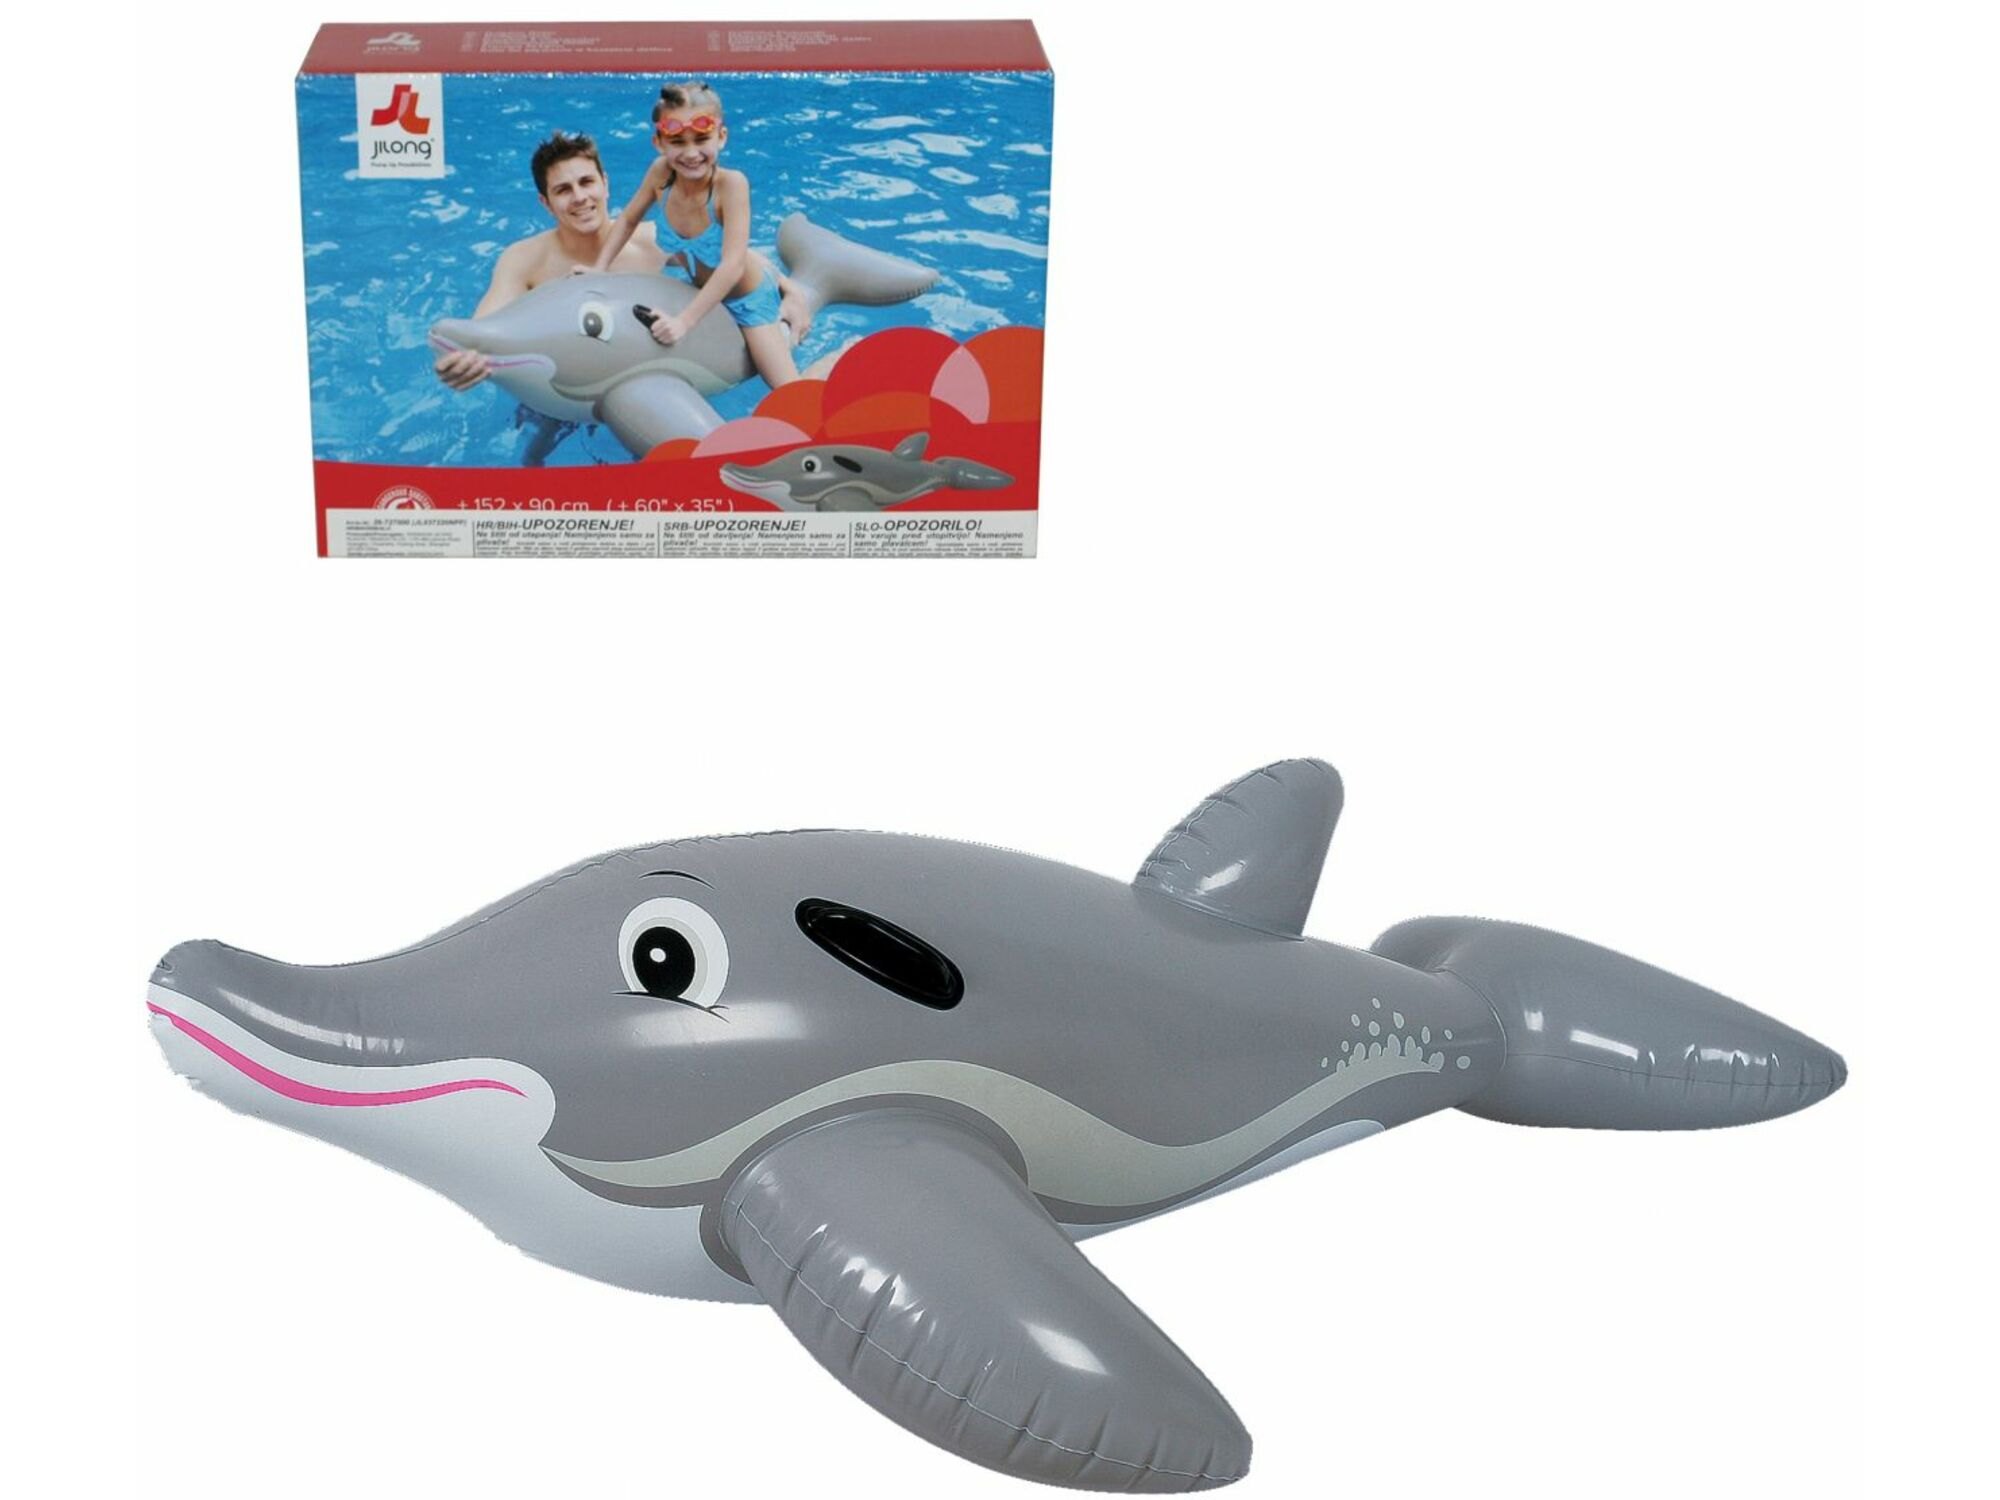 Delfin Rider 152x90 cm 26-727000